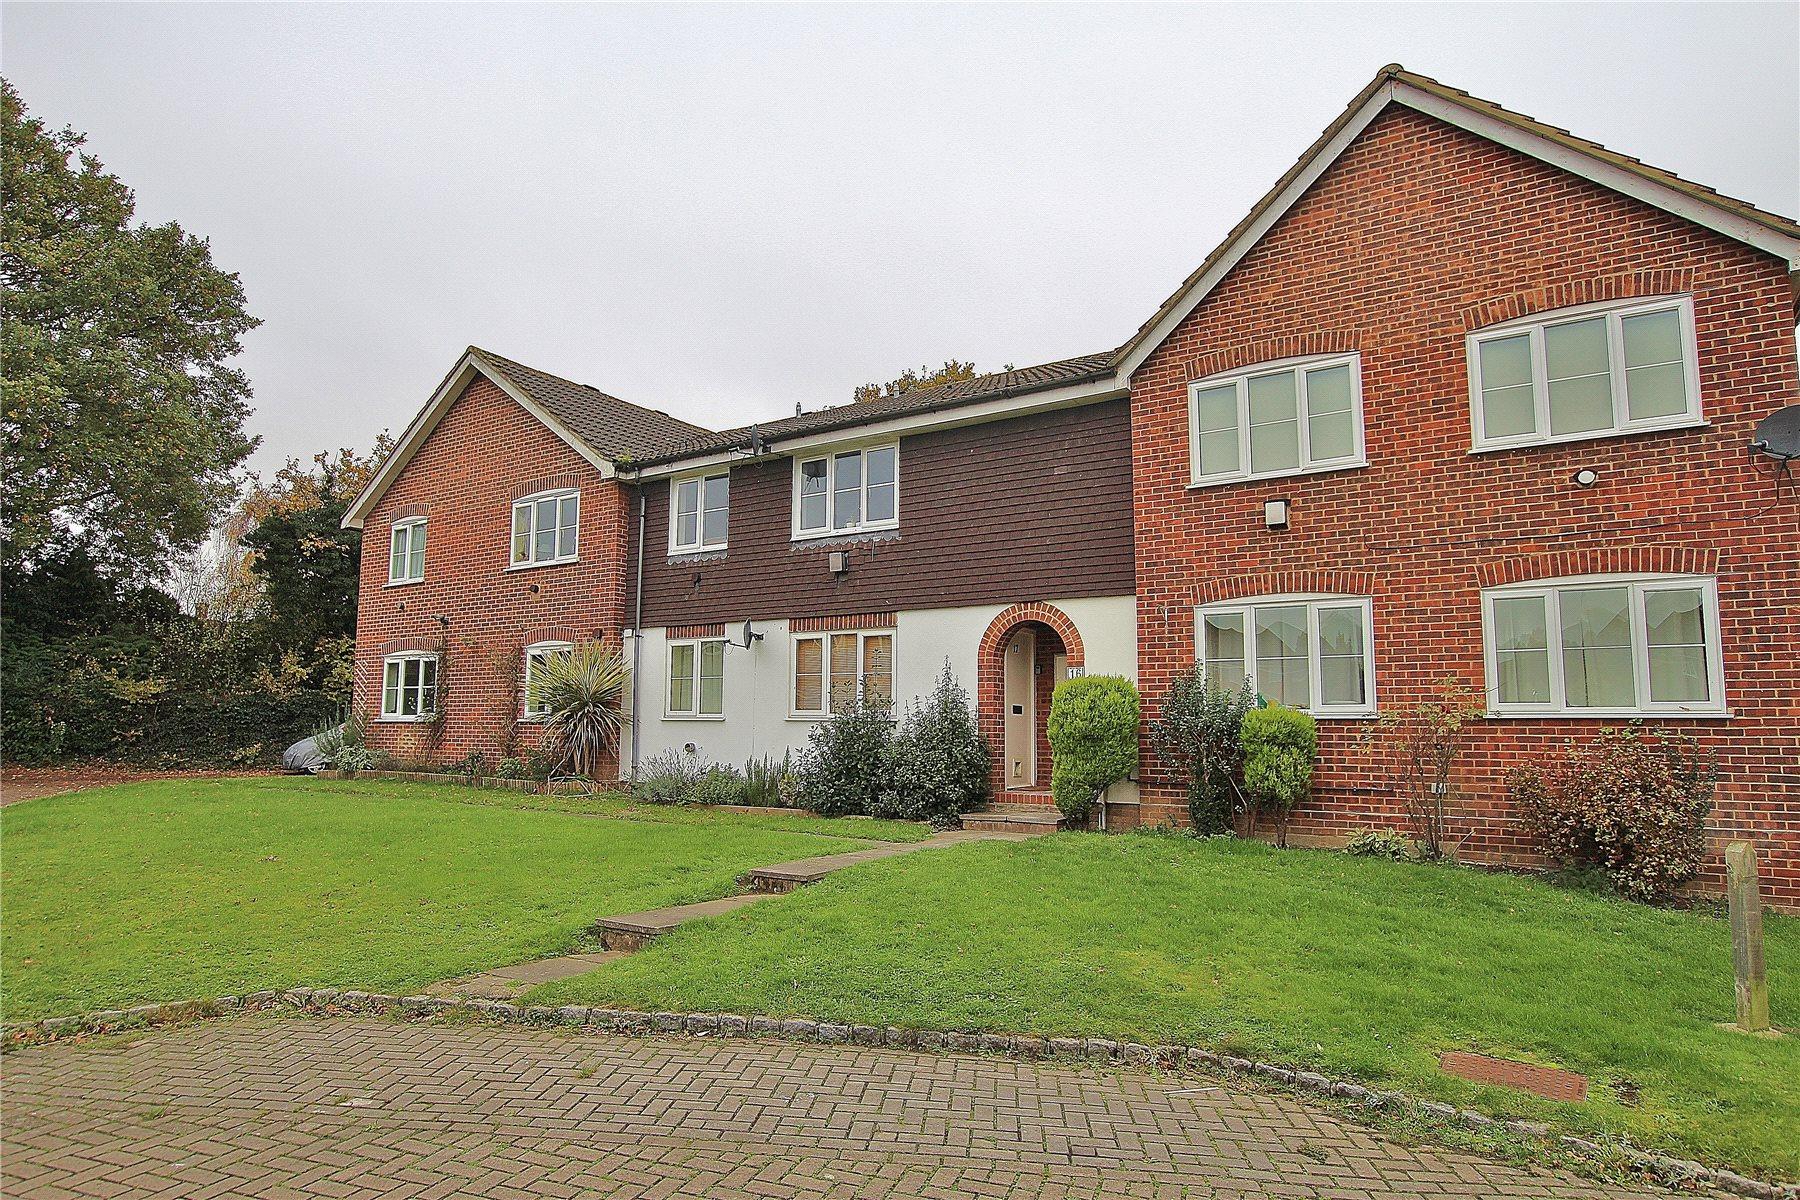 1 Bedroom Apartment Flat for sale in Kingcup Drive, Bisley, Woking, Surrey, GU24